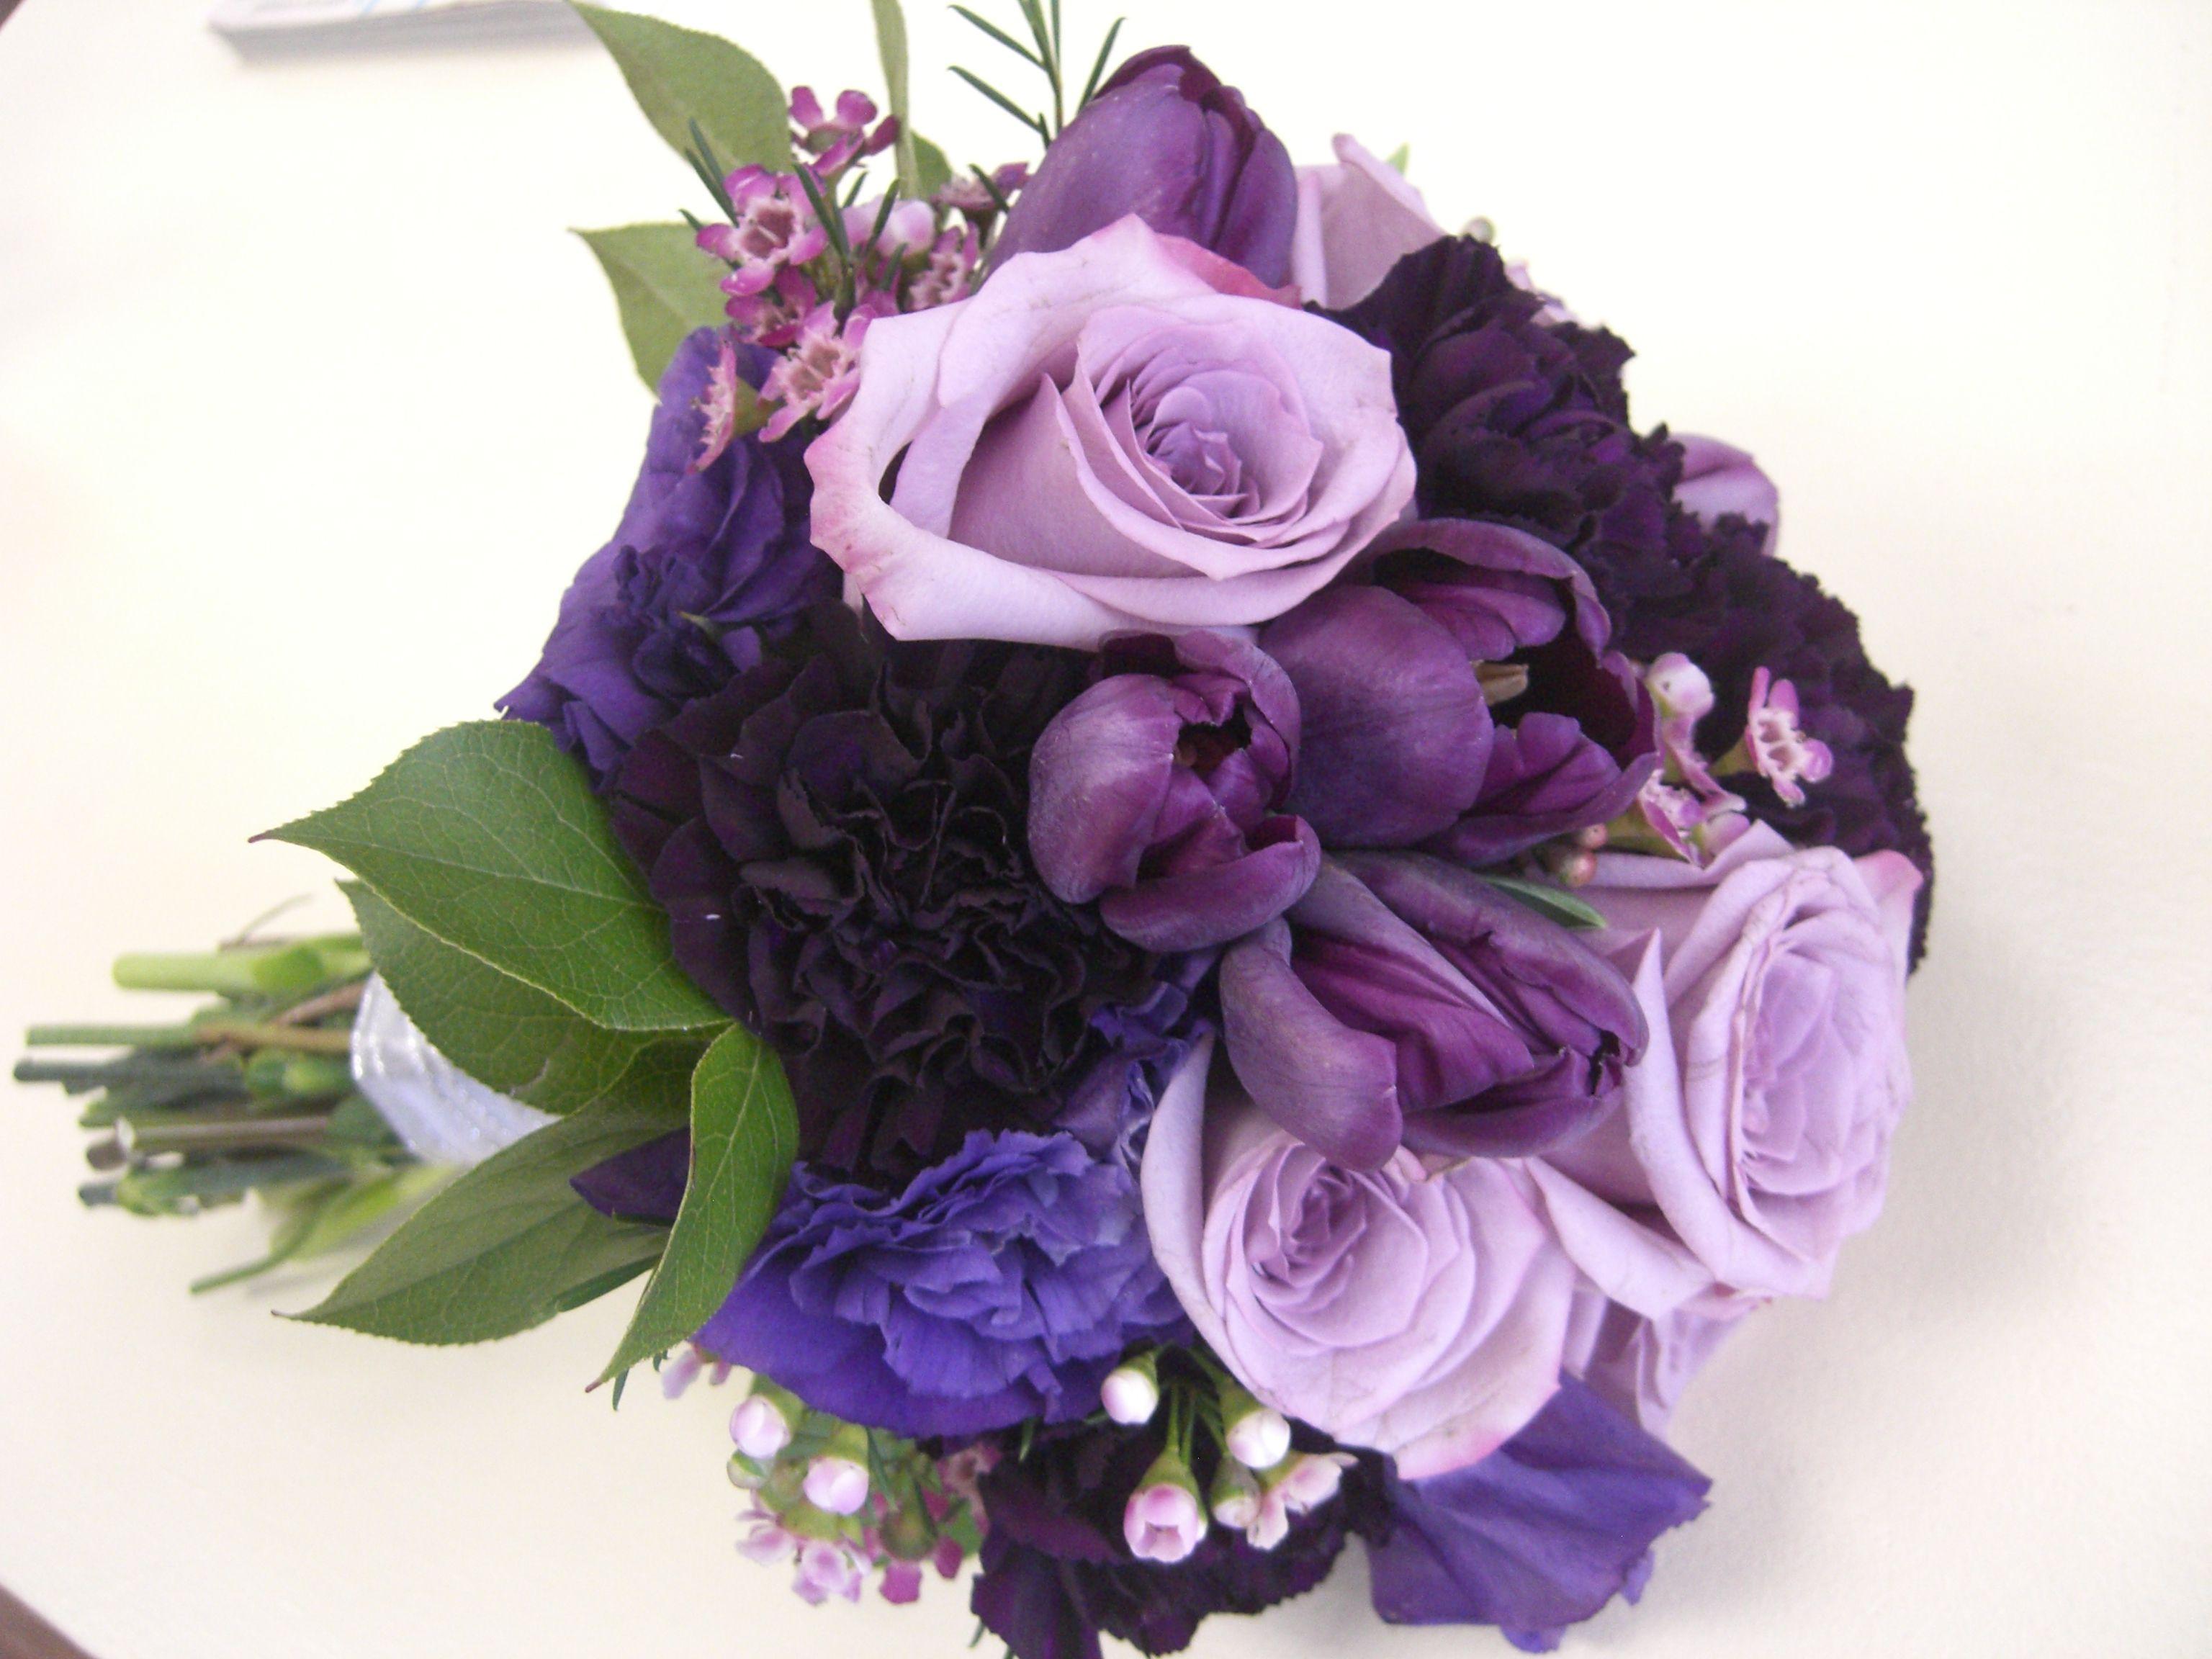 Tulip purple lisianthus purple carnation bouquet white hydrangea tulip purple lisianthus purple carnation bouquet white hydrangea white thecheapjerseys Choice Image